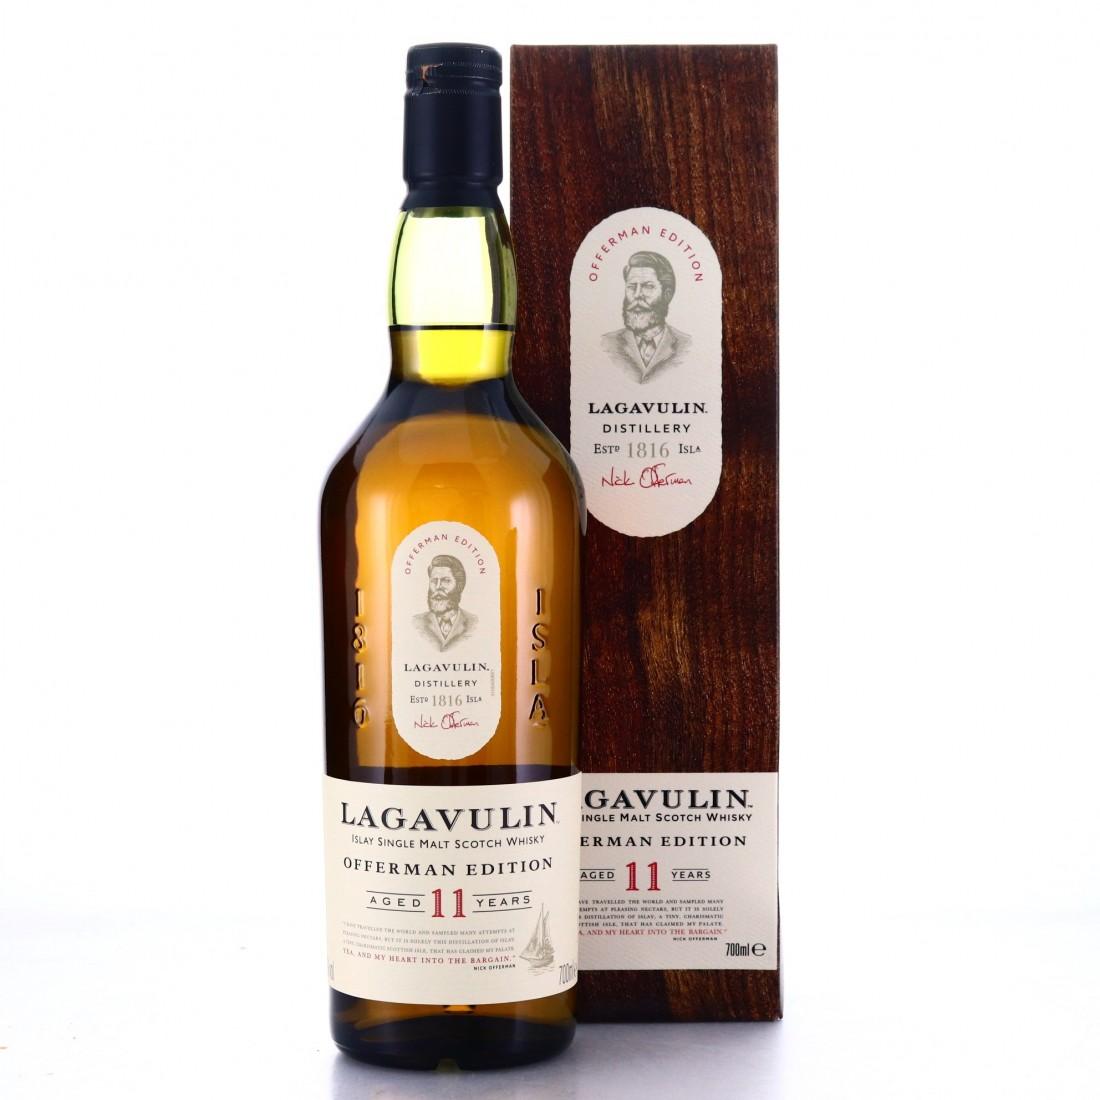 Lagavulin Offerman Edition 11 Year Old